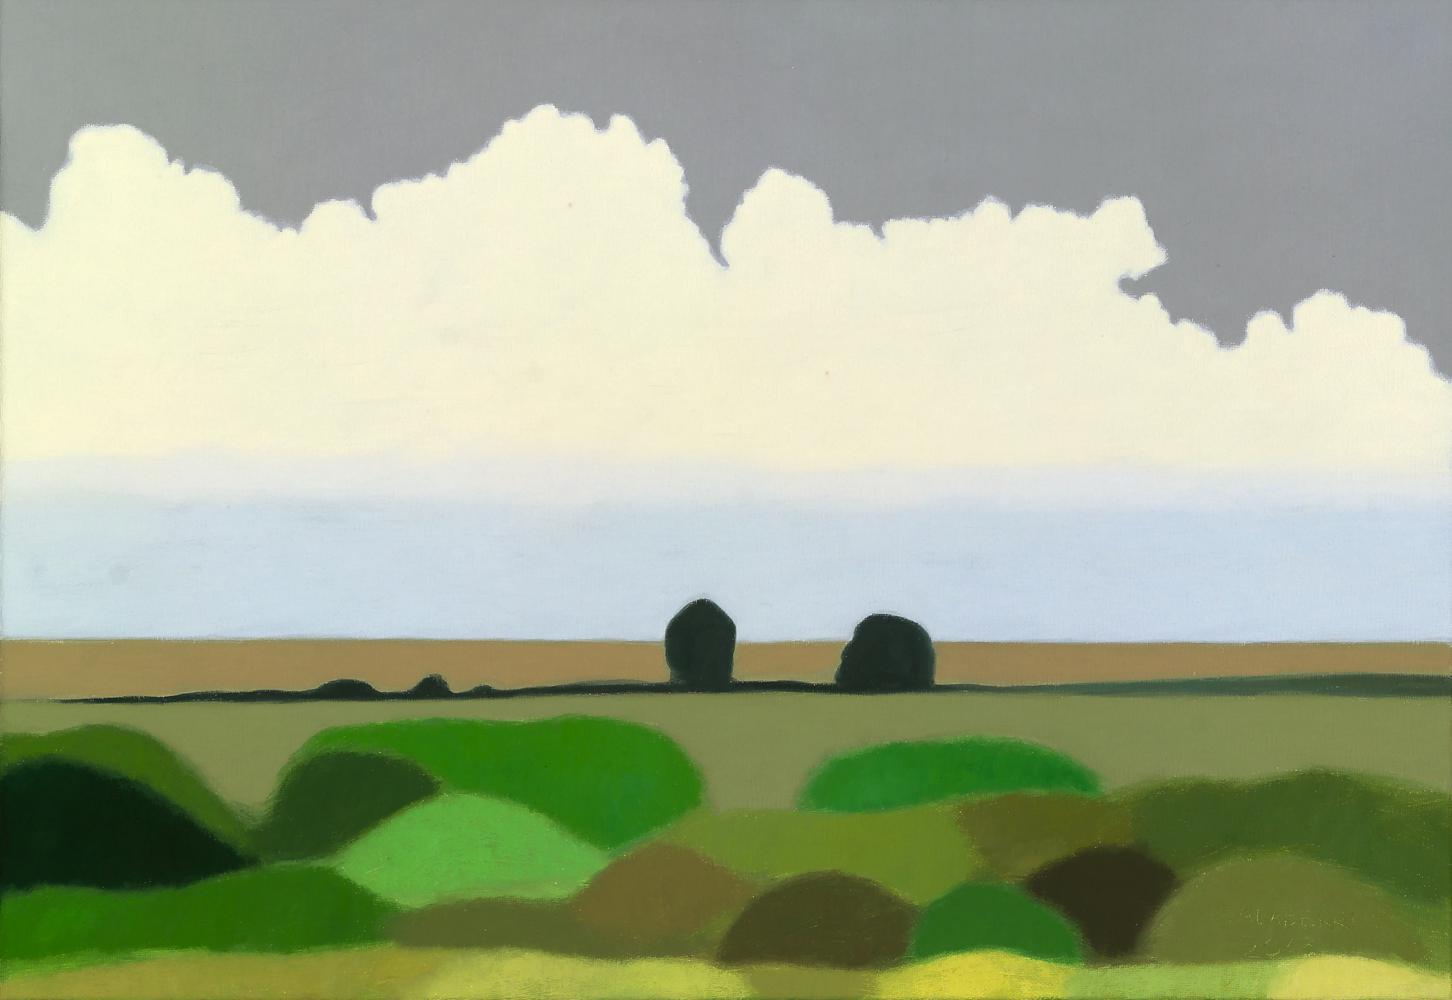 Campos de Uruguay II, 38 x 55 cm, óleo lienzo, 2015.